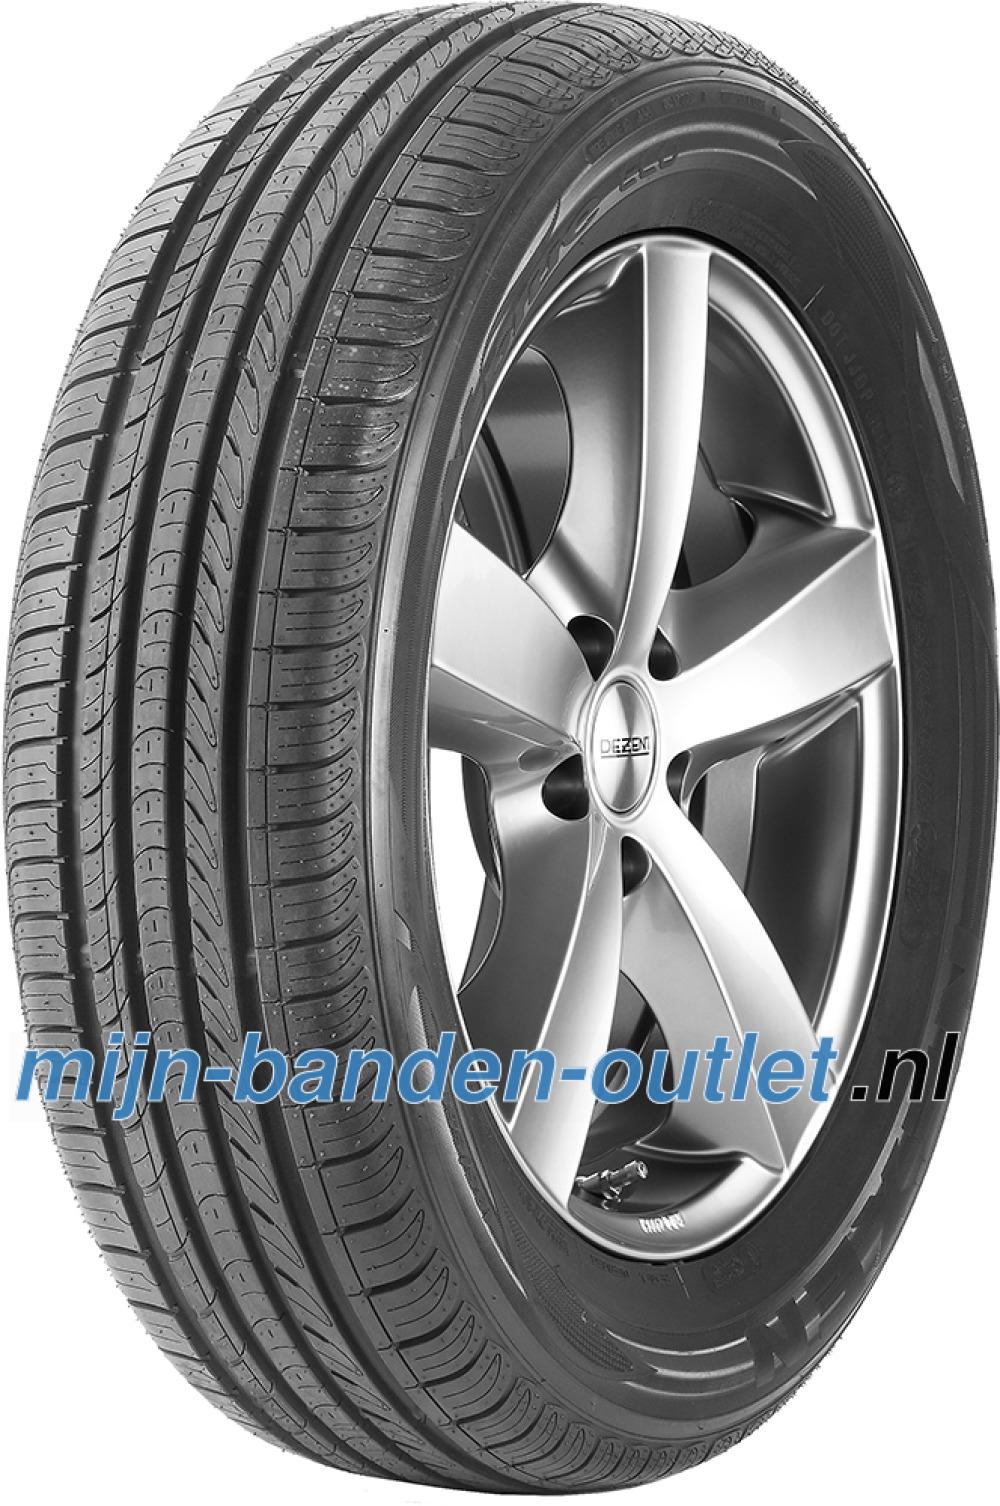 Nexen N blue Eco ( 165/70 R14 81T 4PR )